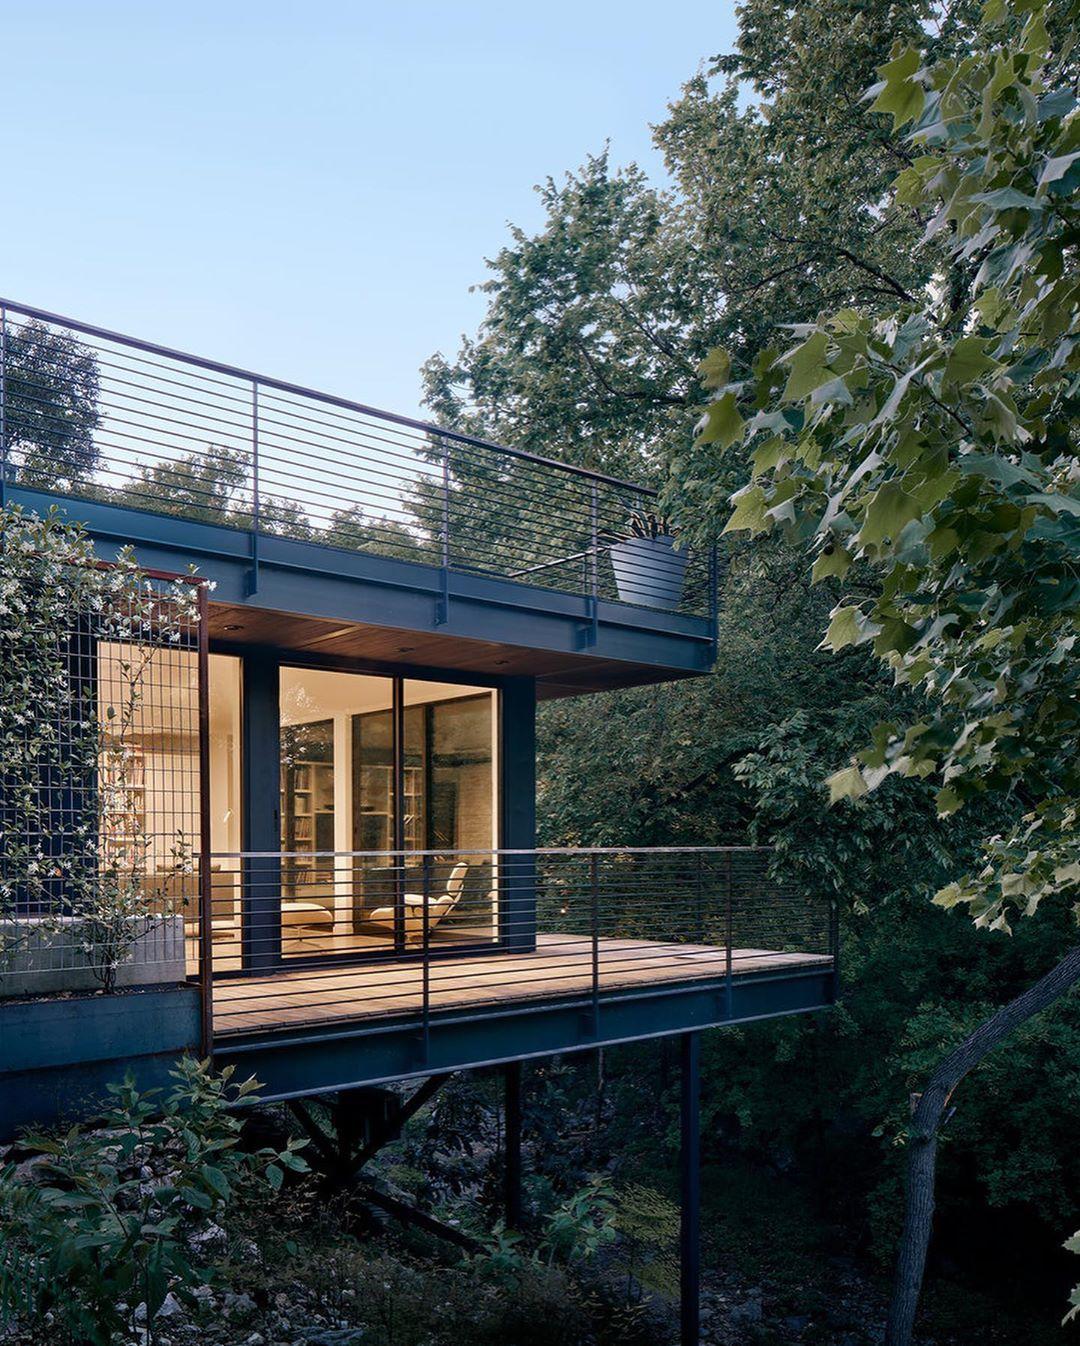 Architecture Addicted Avec Airbnb Recoit 34 Euros En Cliquant Ici Locations Vacances Immobilier Terrasse Suspendue